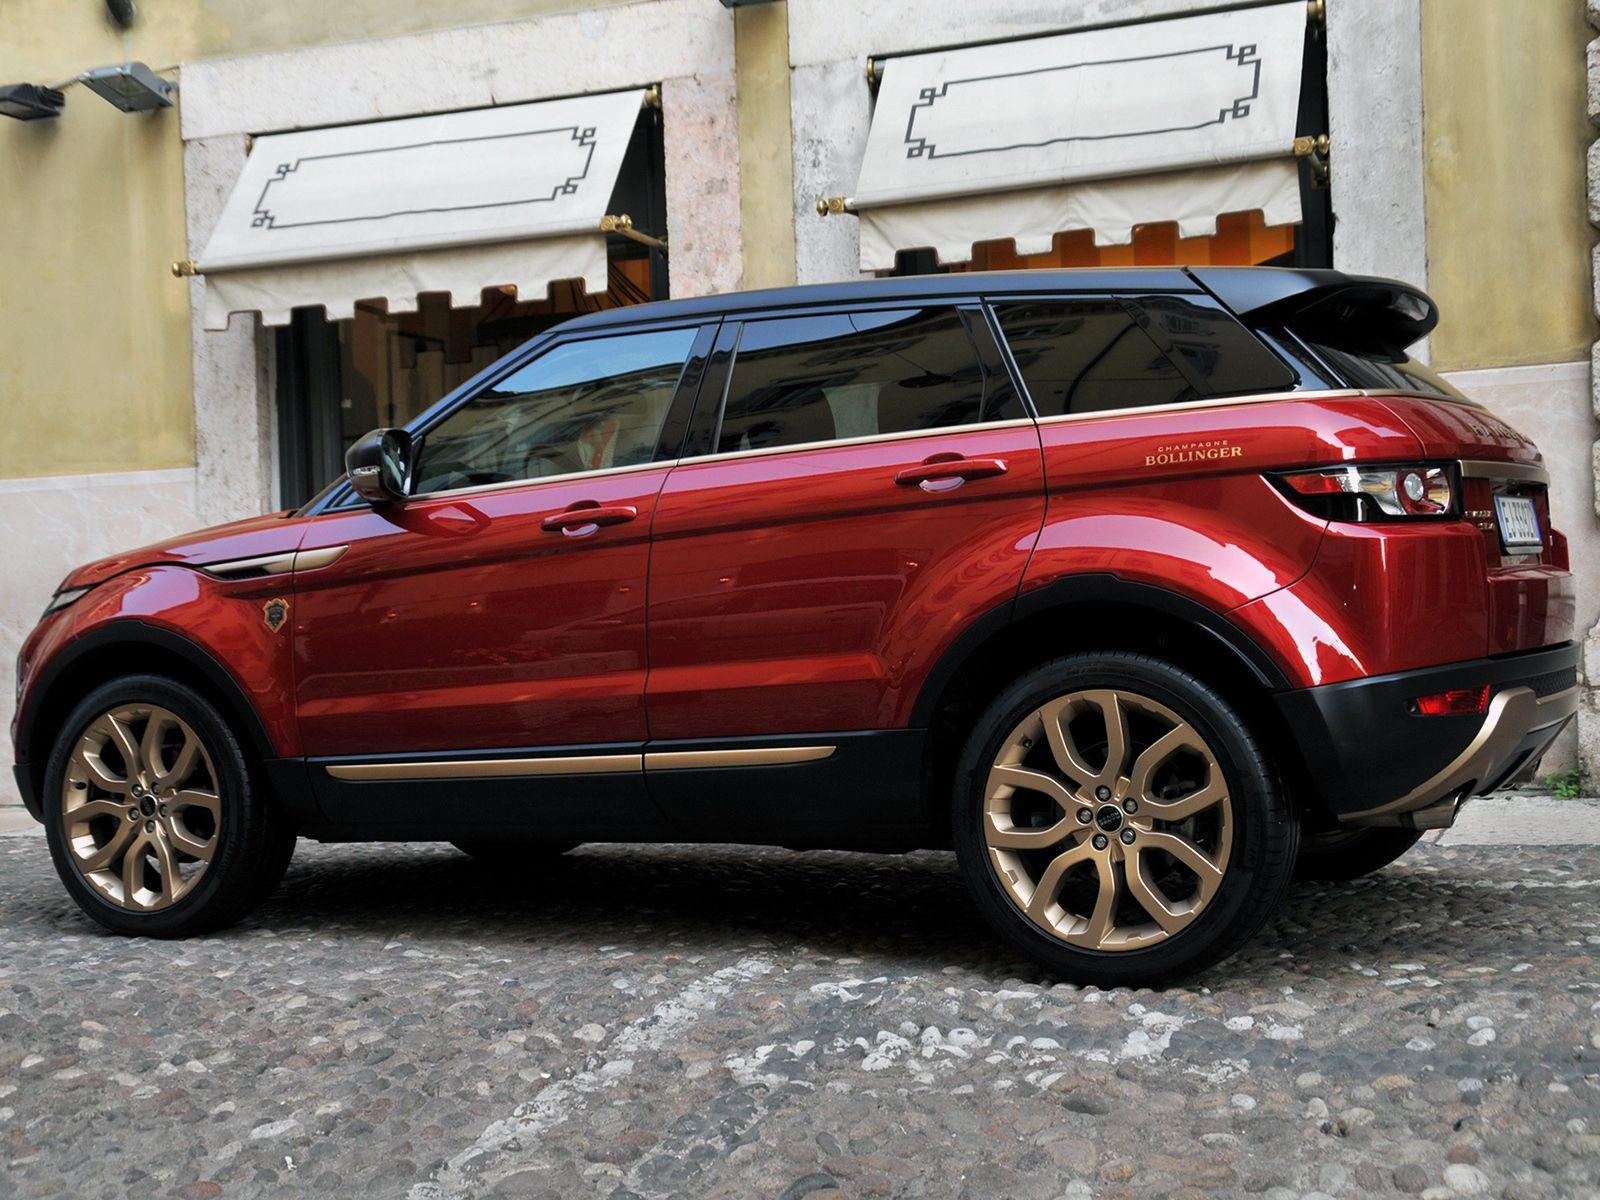 Land Rover Range Rover Evoque Photo 95907 Range Rover Evoque Range Rover Land Rover